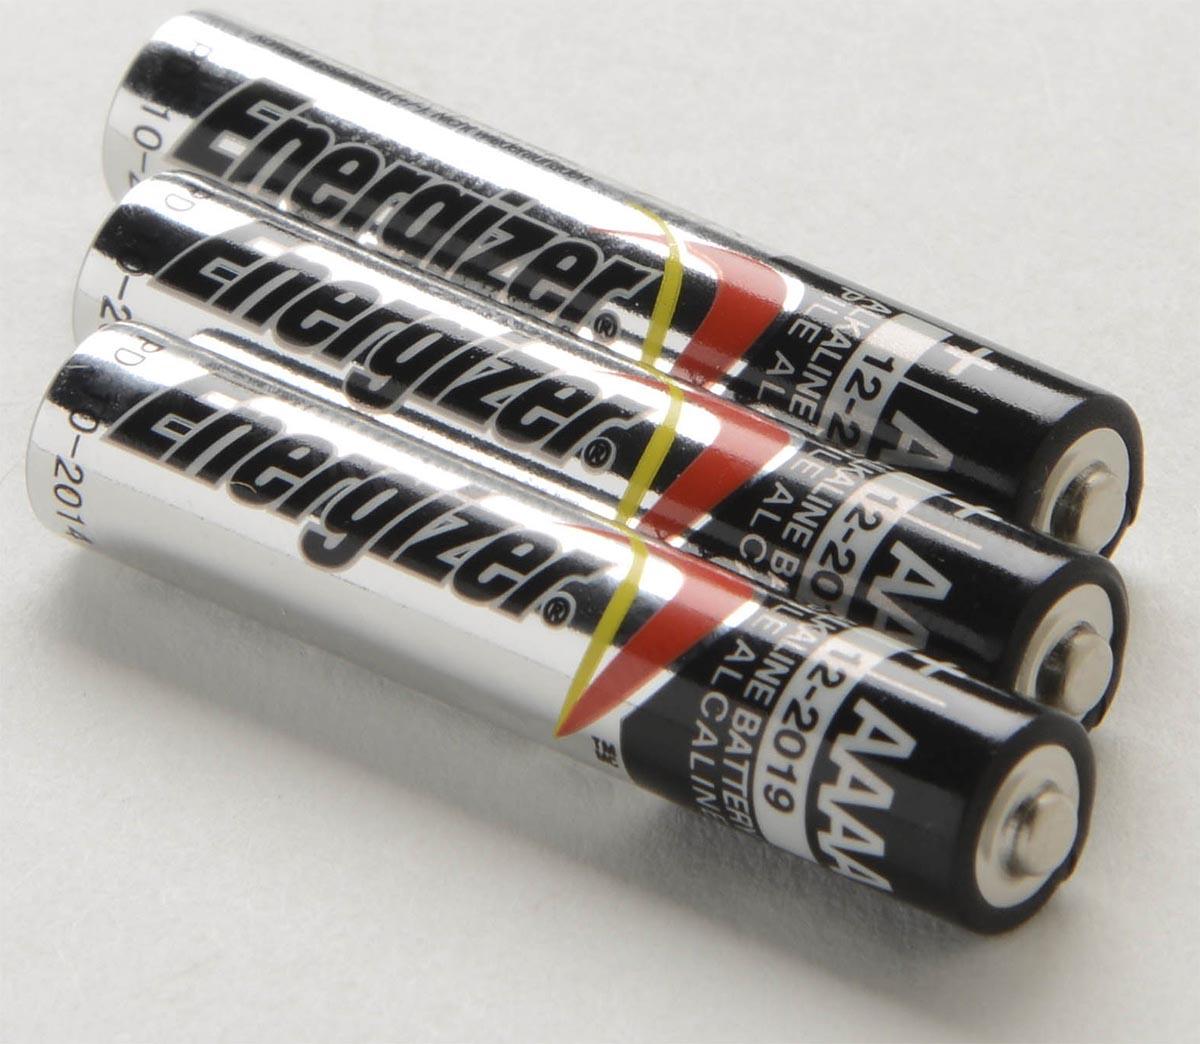 pelican 1839 replacement flashlight batteries